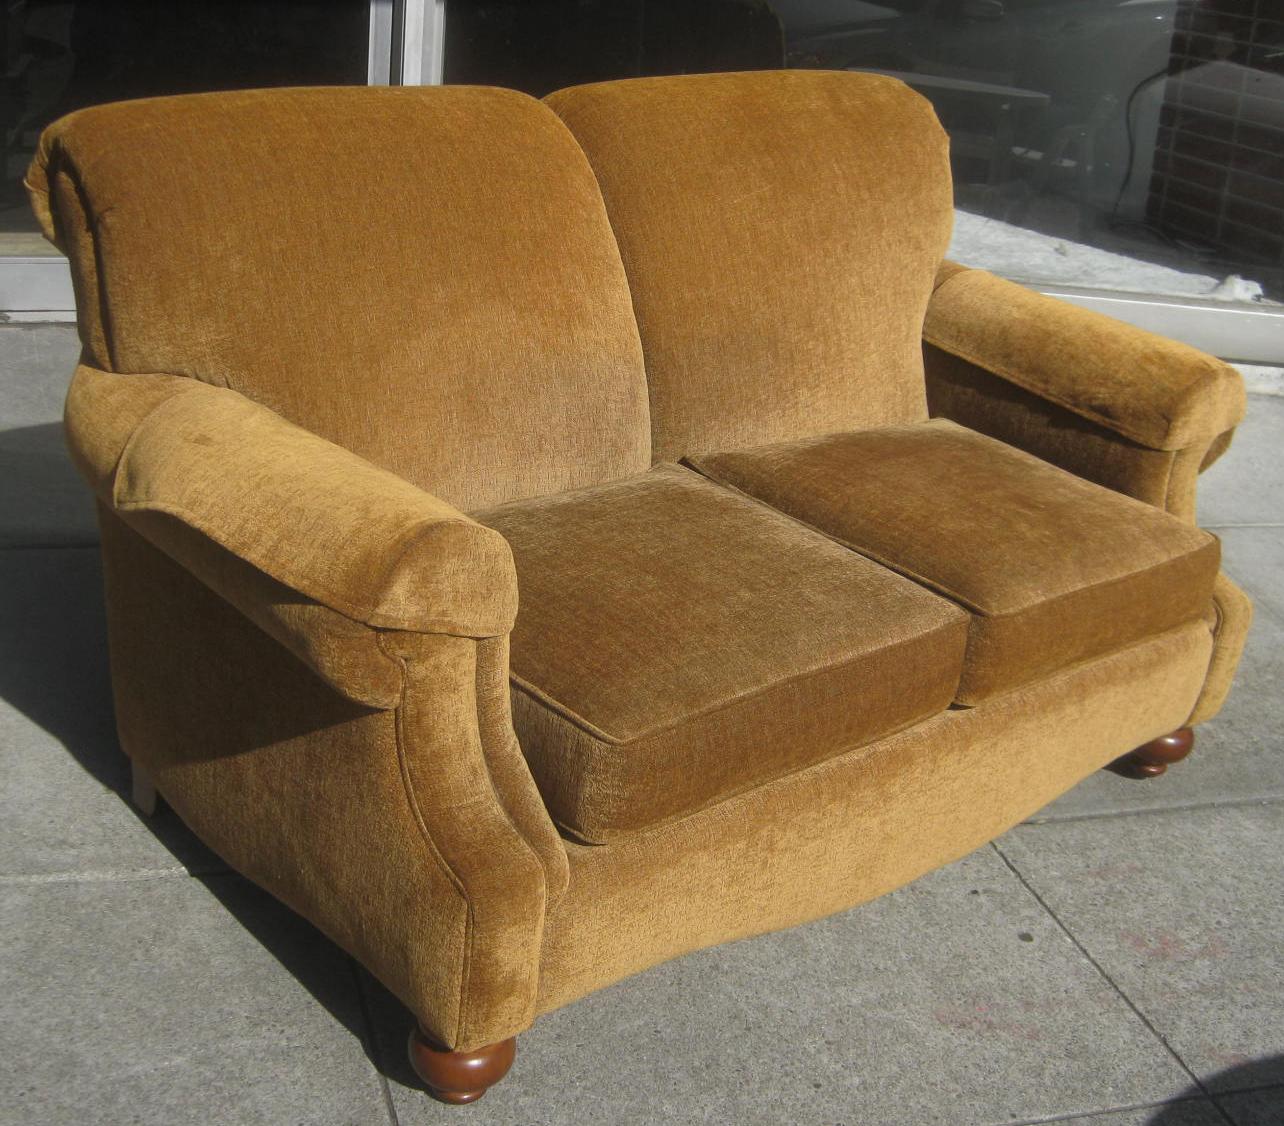 Uhuru Furniture Collectibles Sold Bassett Loveseat 150